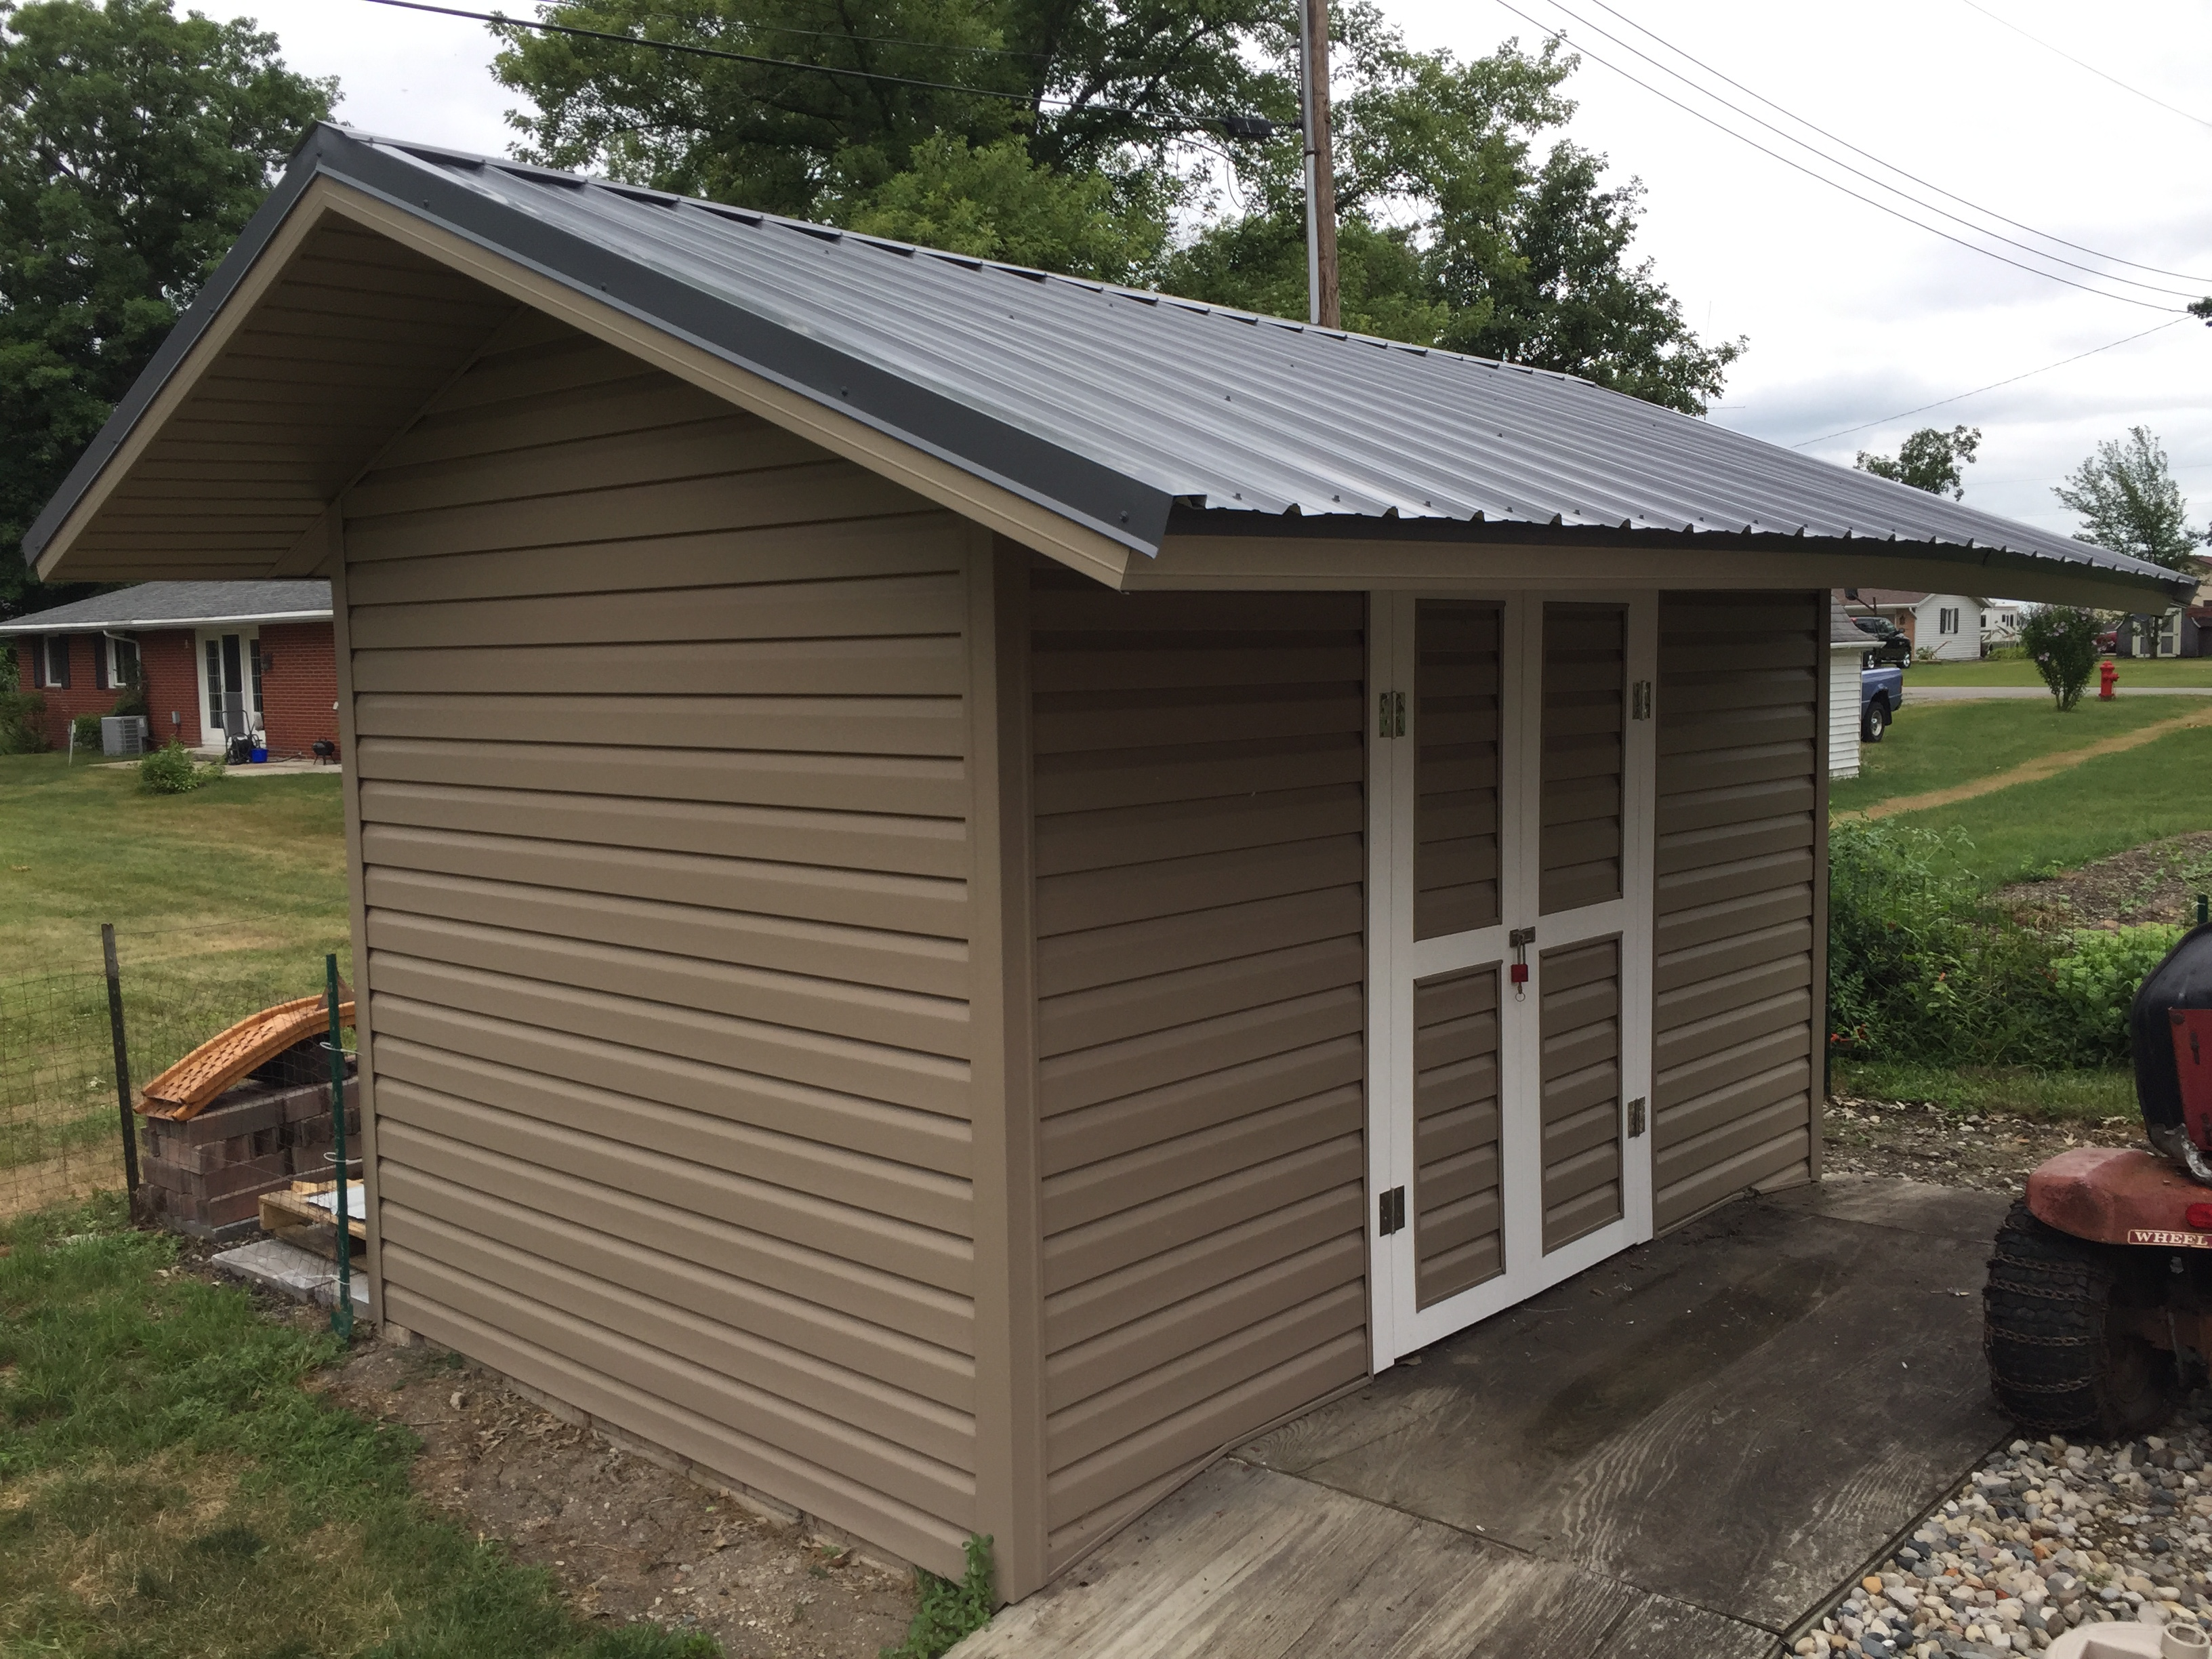 8 x 16 Storage Shed Refurbish – Sherwood, Ohio